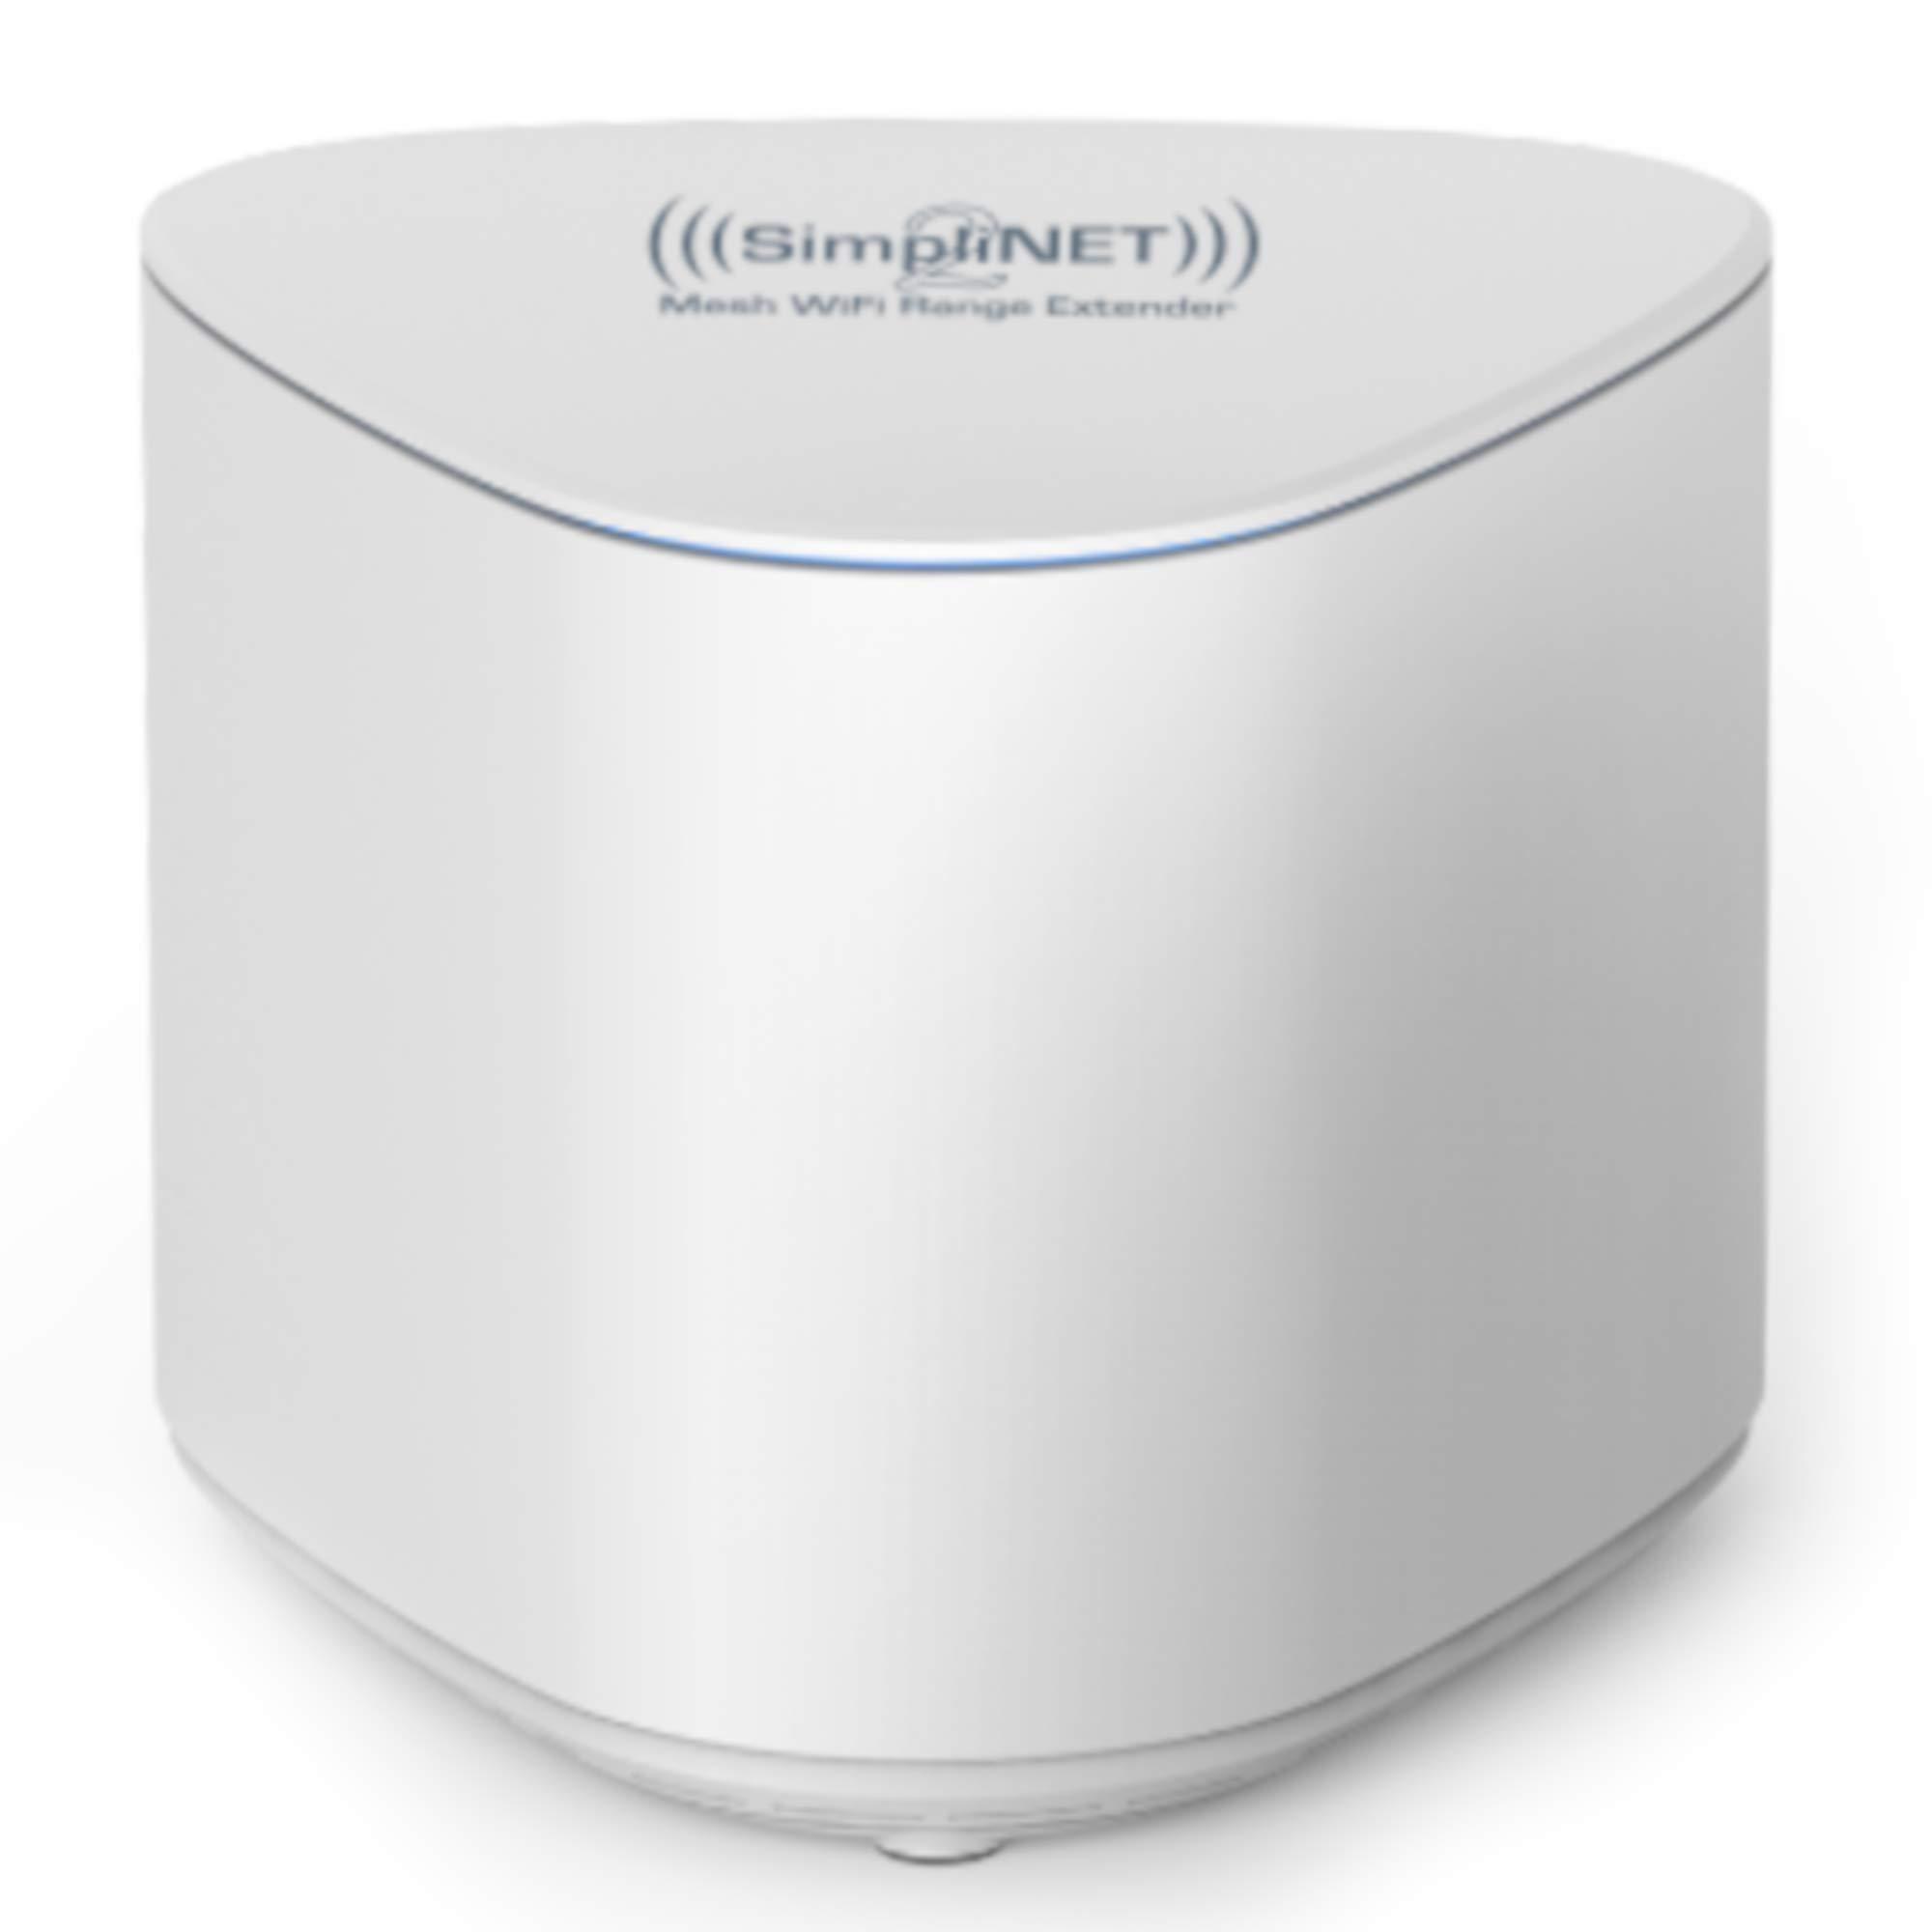 SimpliNET2 Whole Home AC2100 Mesh WiFi Range Extender with Firewall Network Defense by SimpliNET